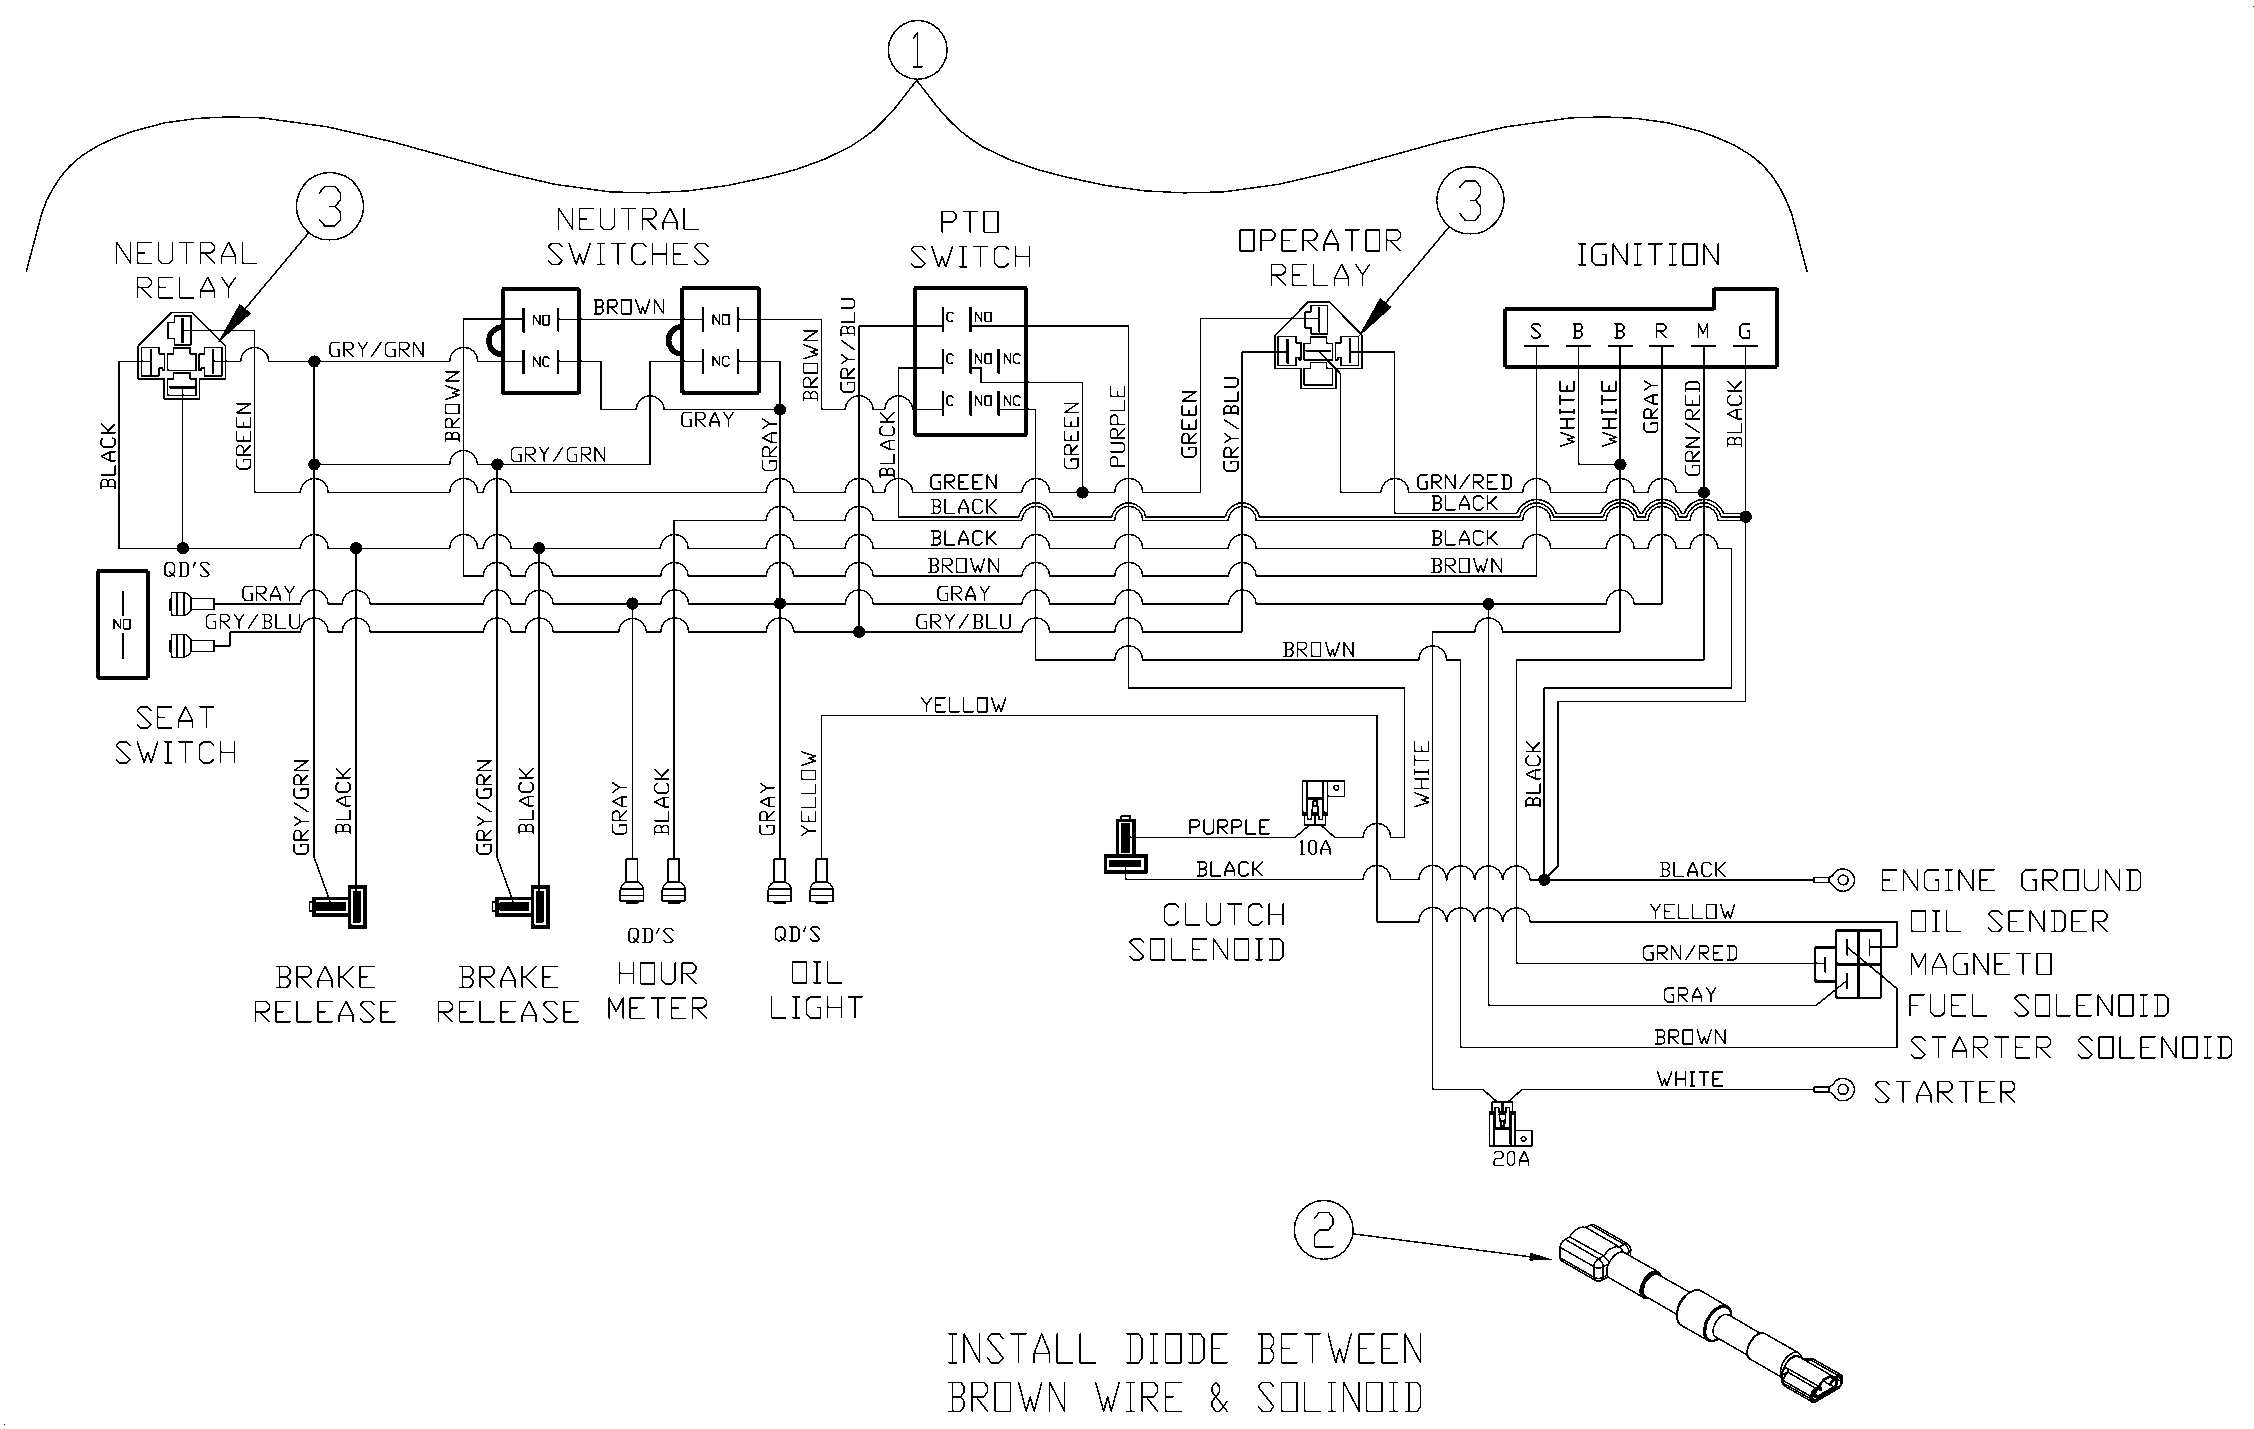 pride wiring harness diagram ml 0392  land pride mower wiring diagram download diagram  land pride mower wiring diagram